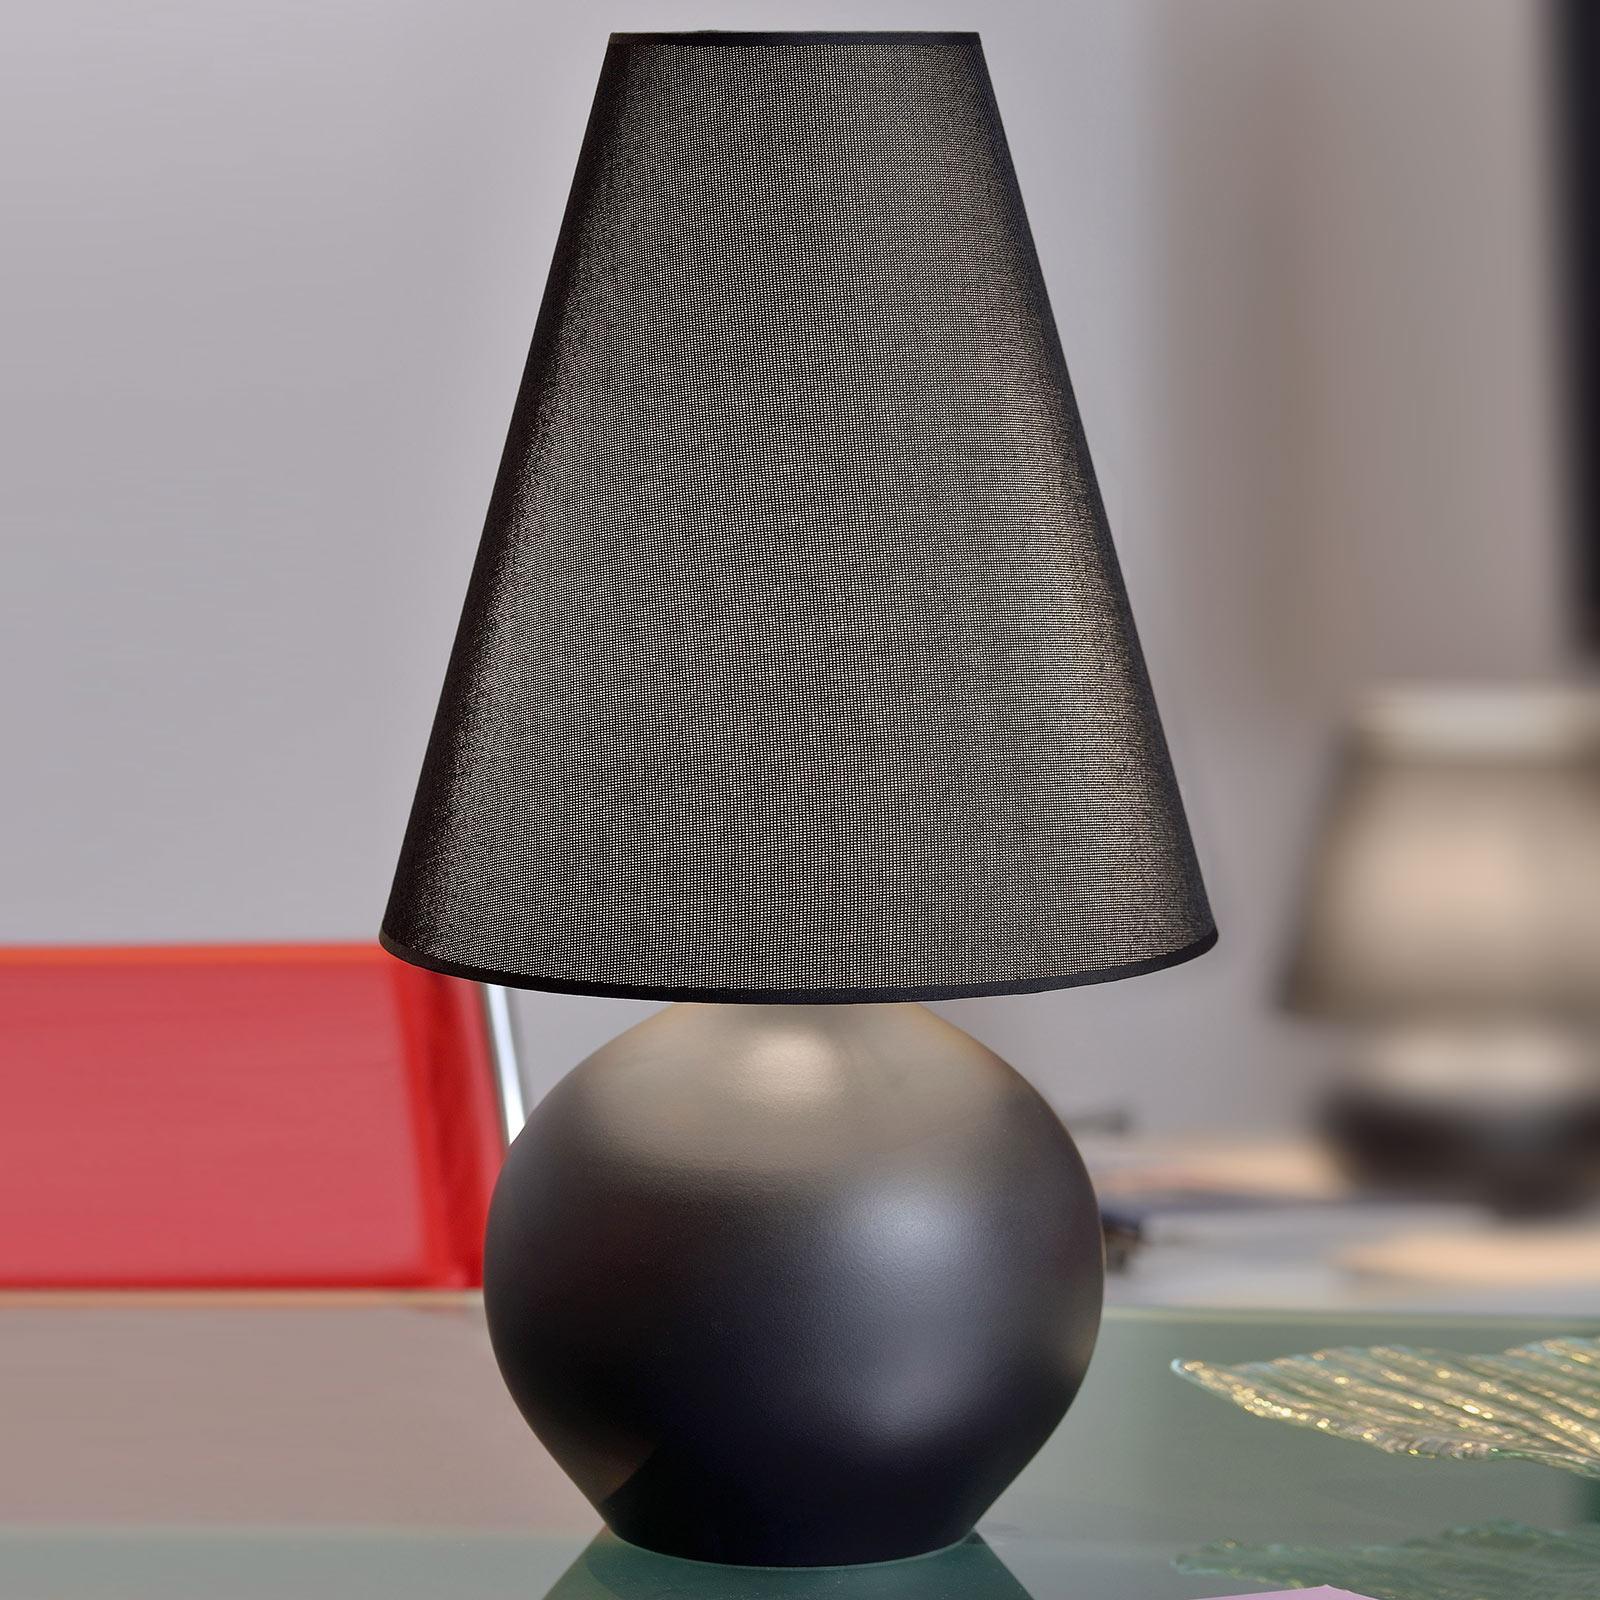 Tafellamp Sfera, hoogte 44 cm, zwart